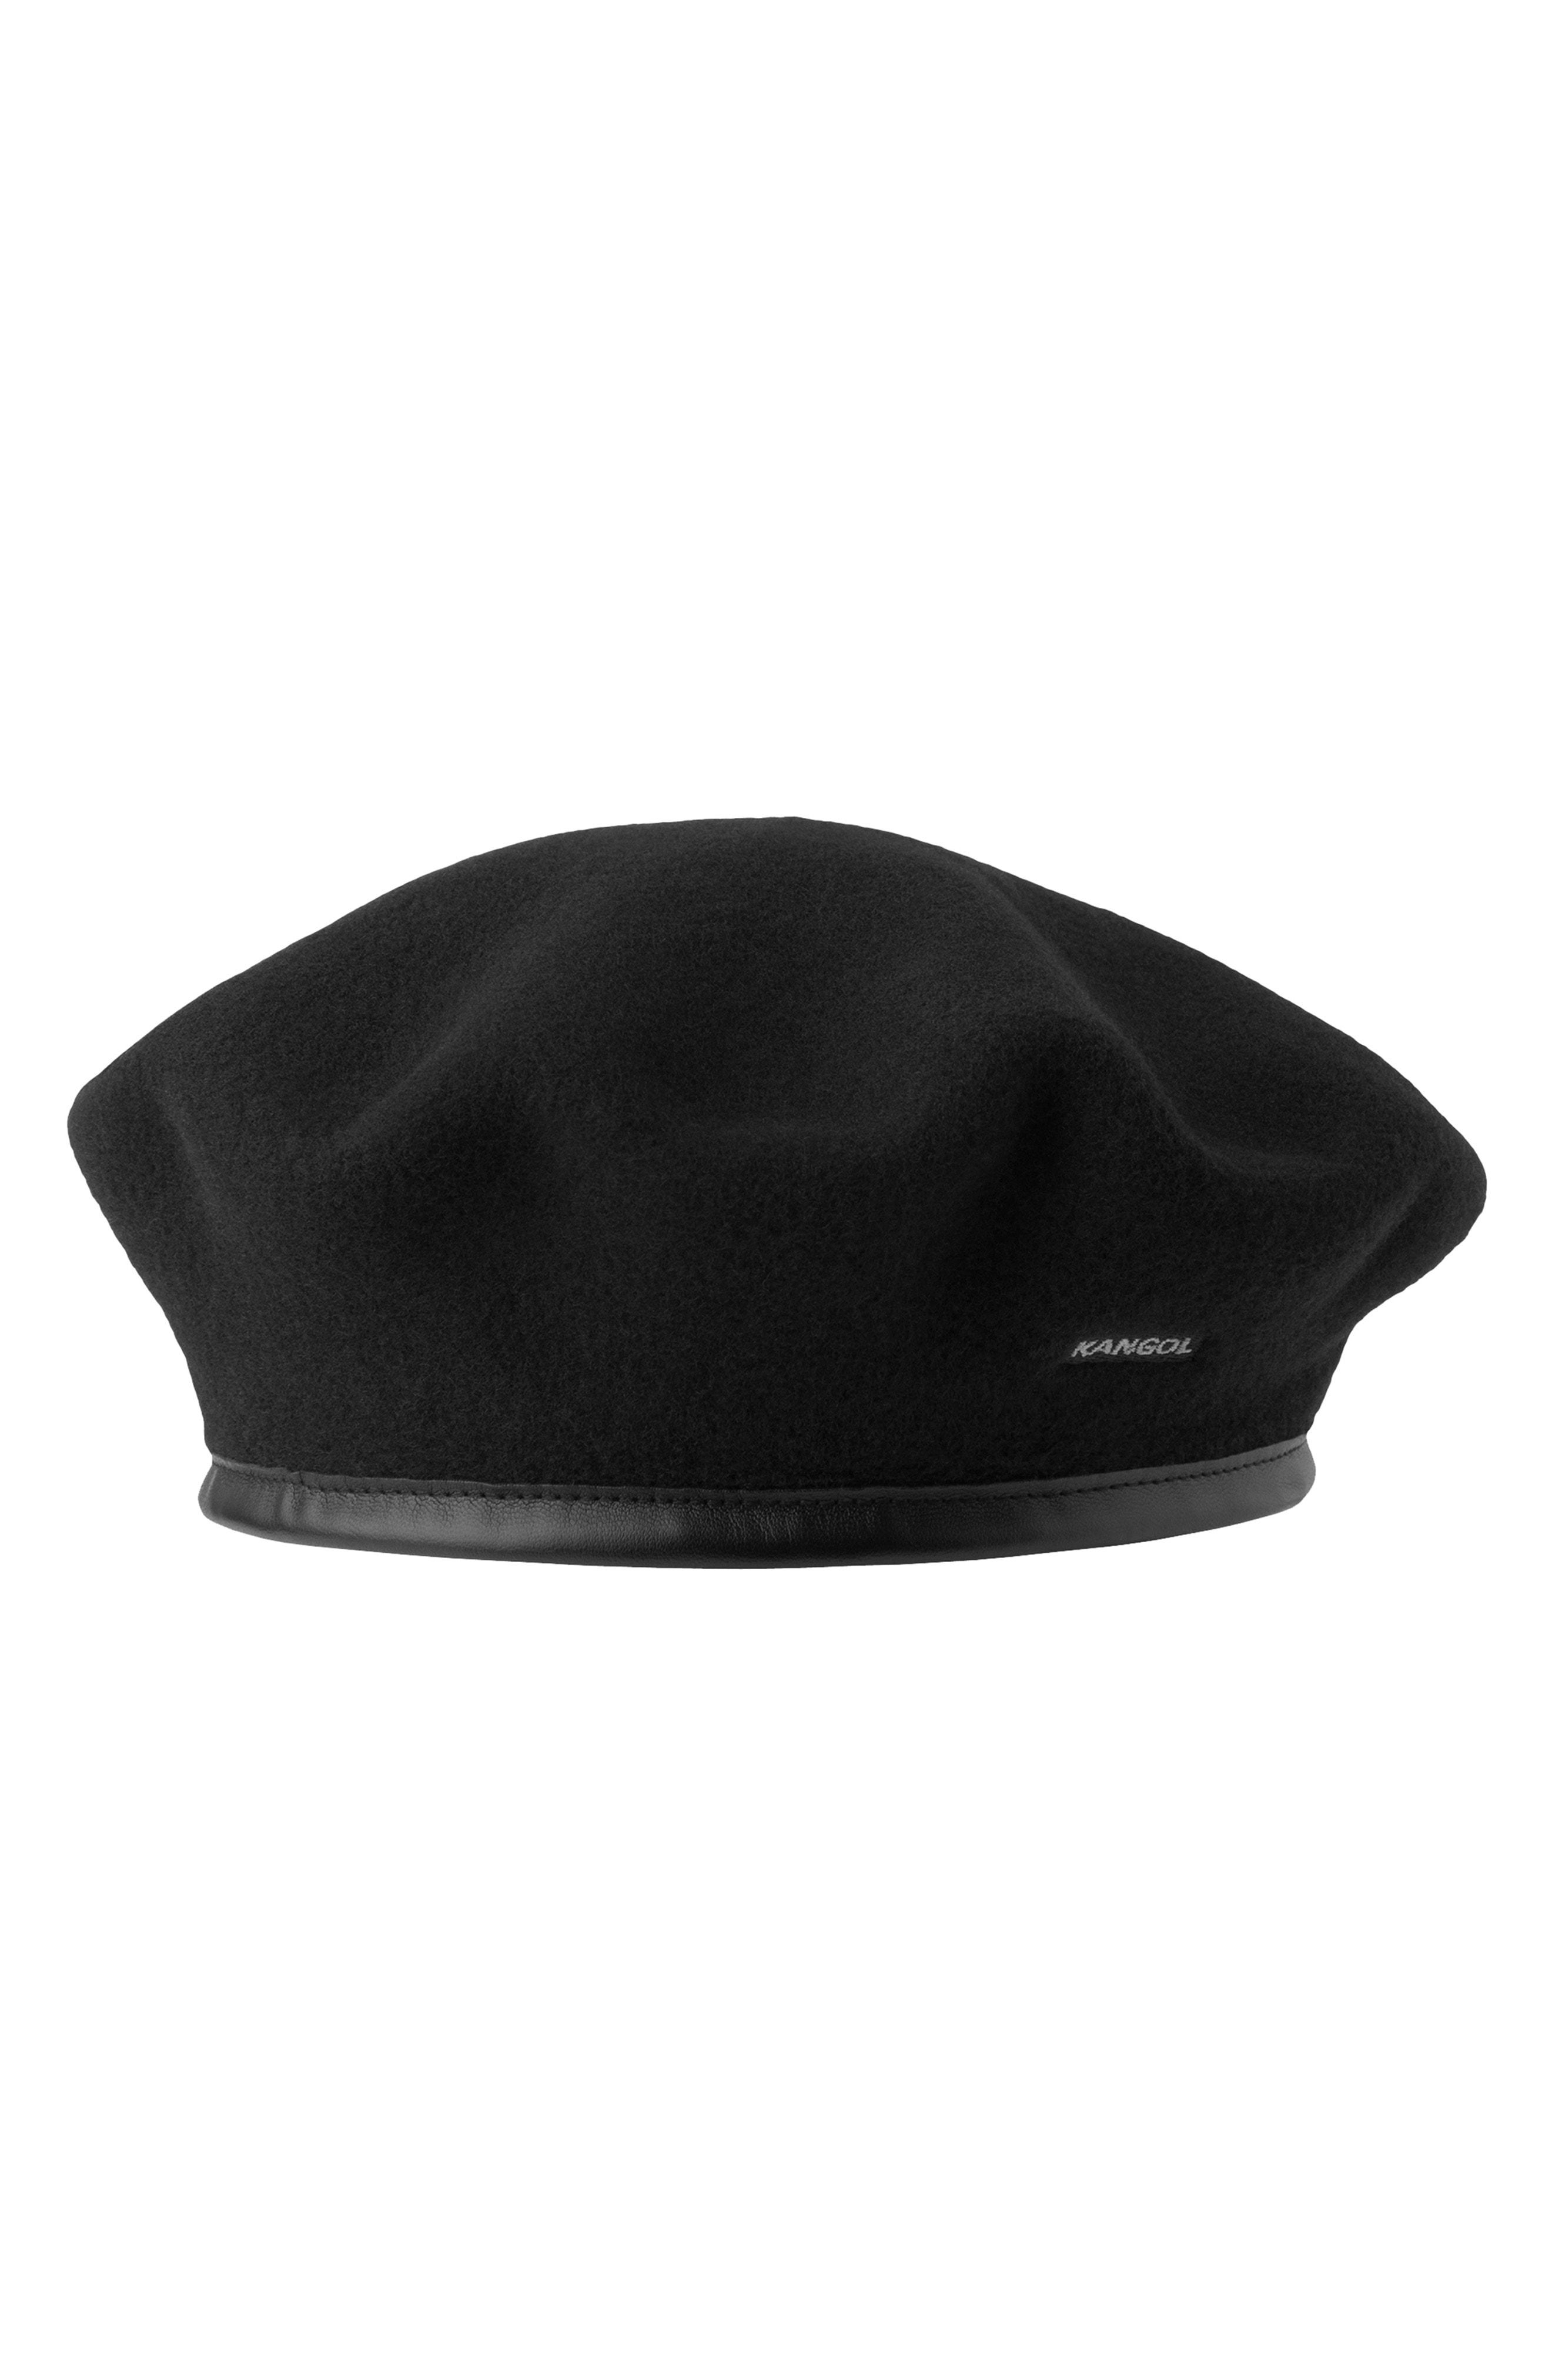 c87b72bfc08e1 Kangol Monty Wool Beret - Black